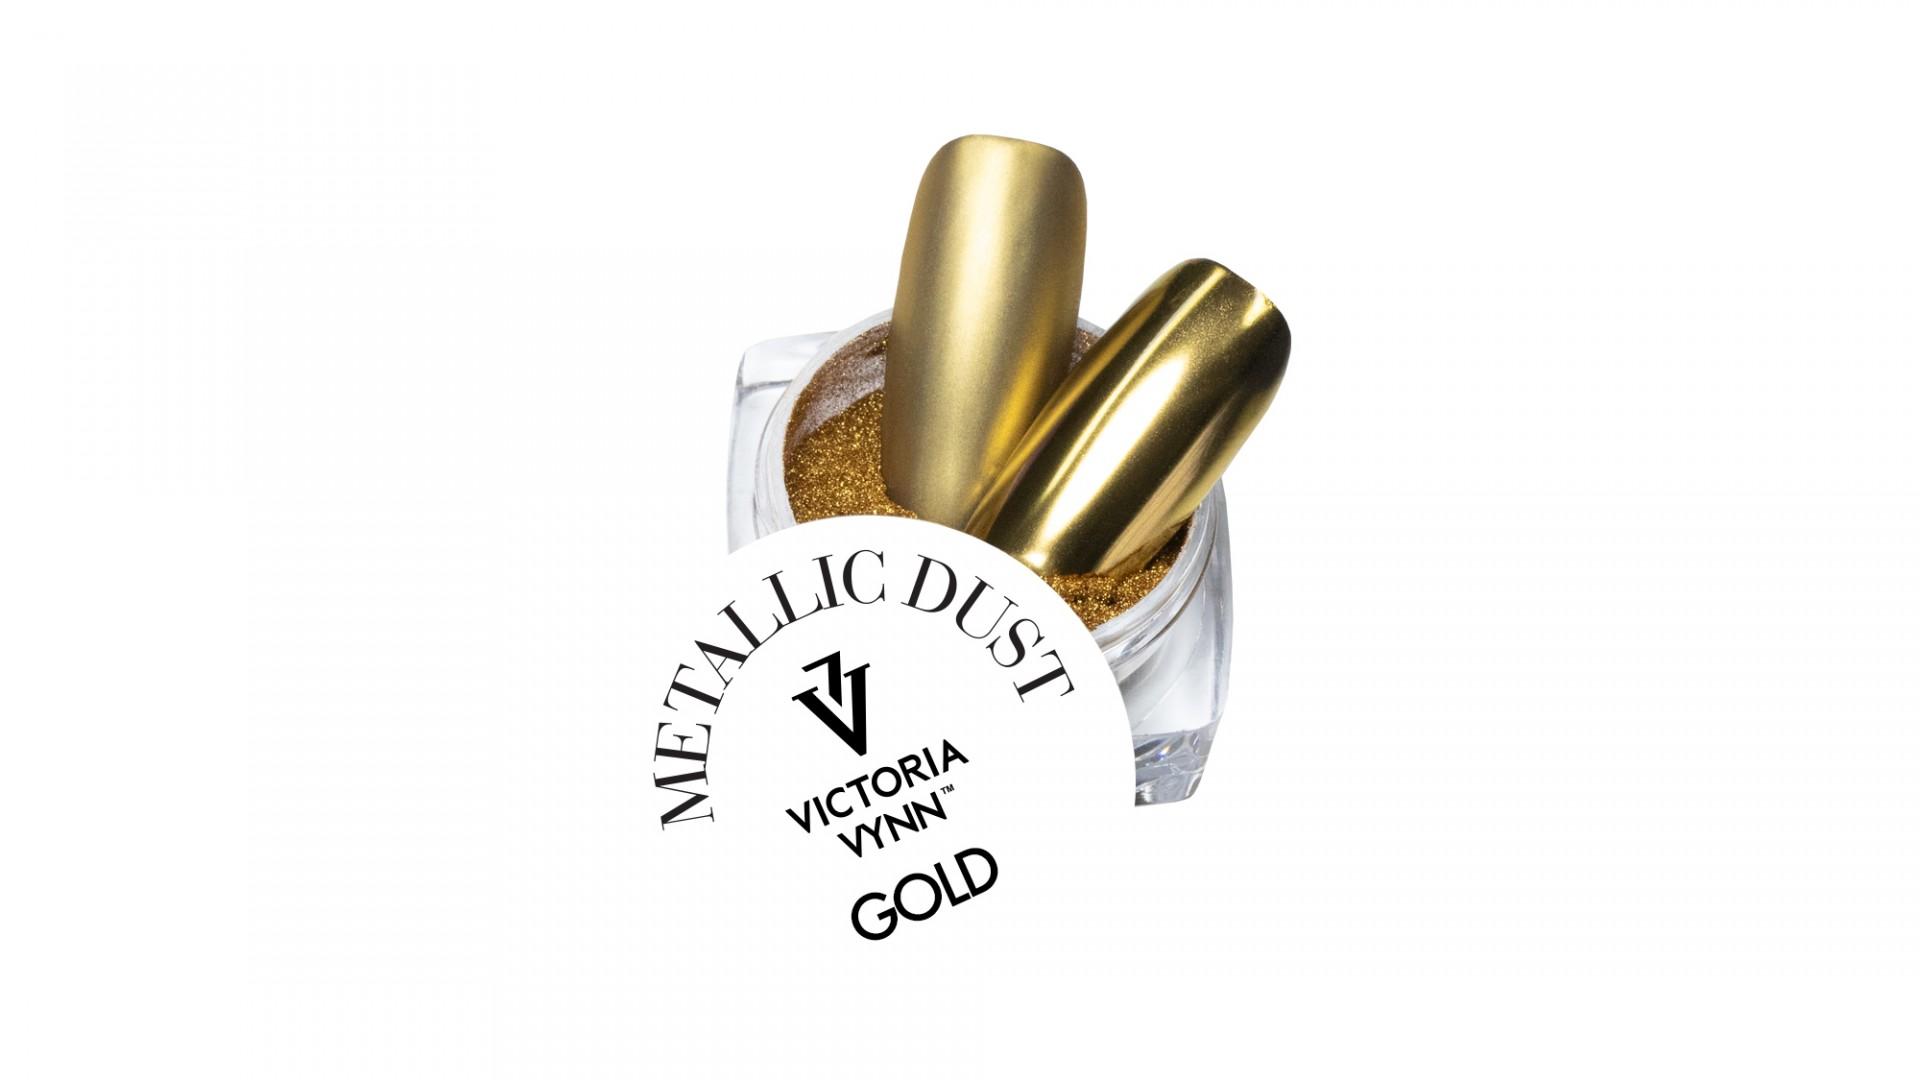 Victoria Vynn Metallic Dusts n.º2 - Gold